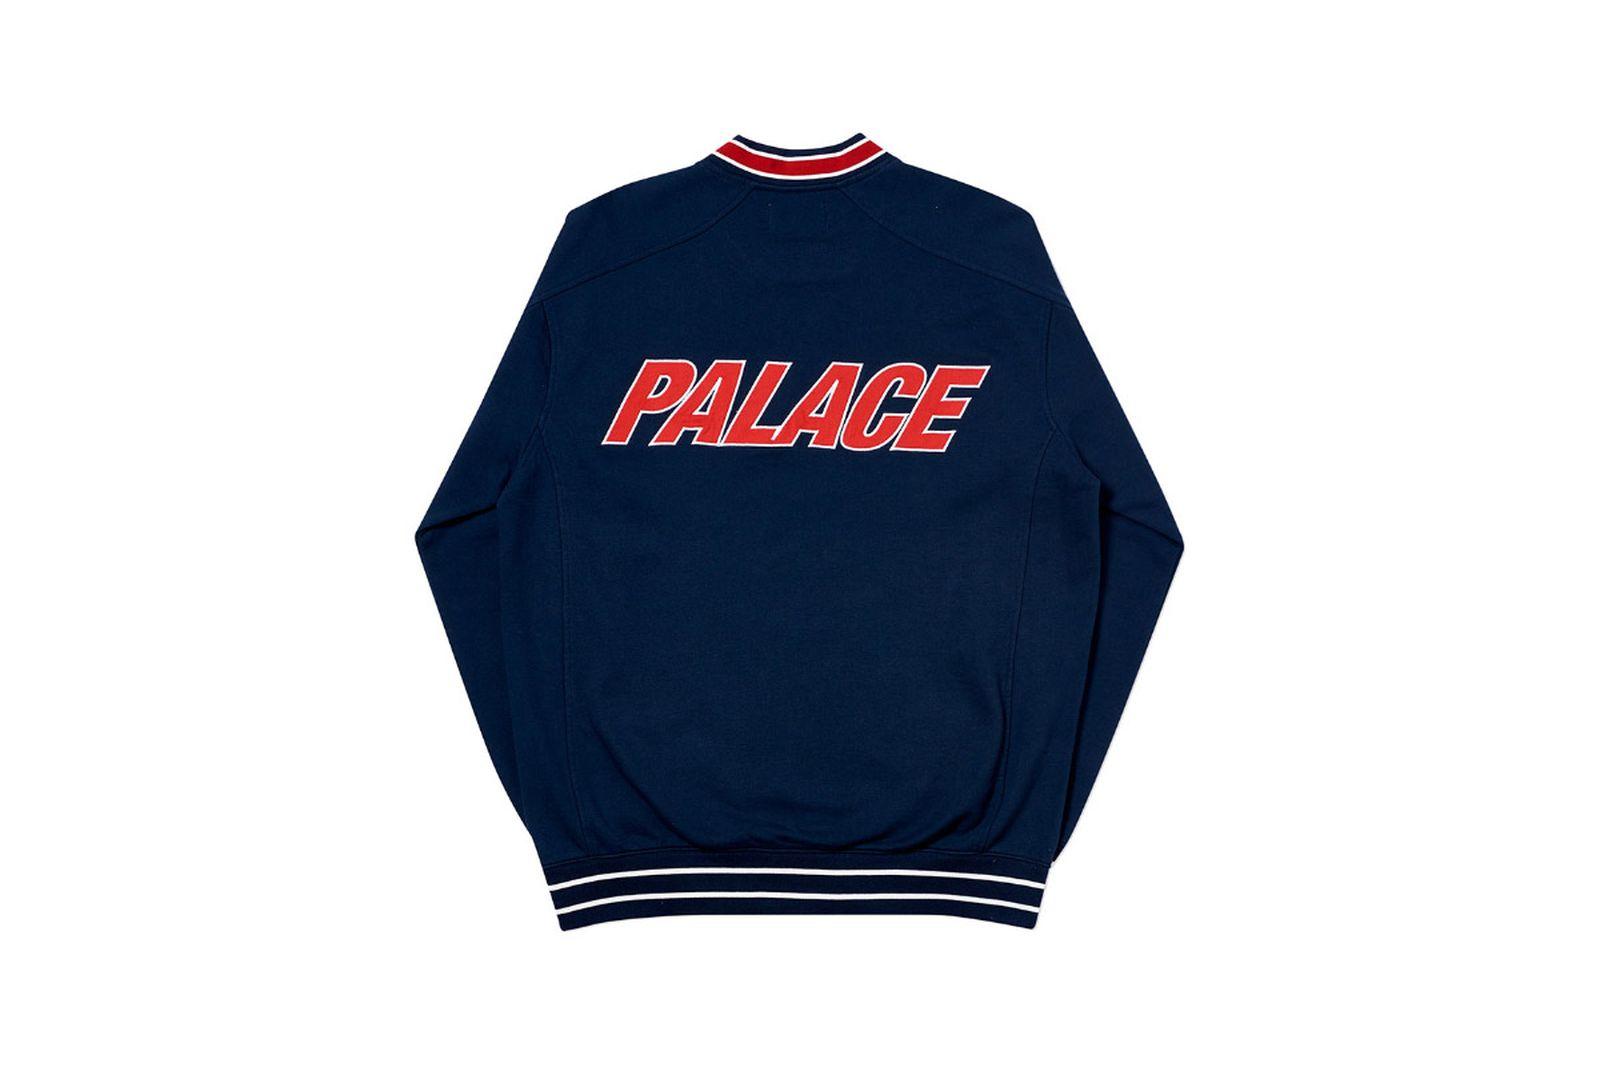 Palace 2019 Autumn crew optimo navy back2067 1